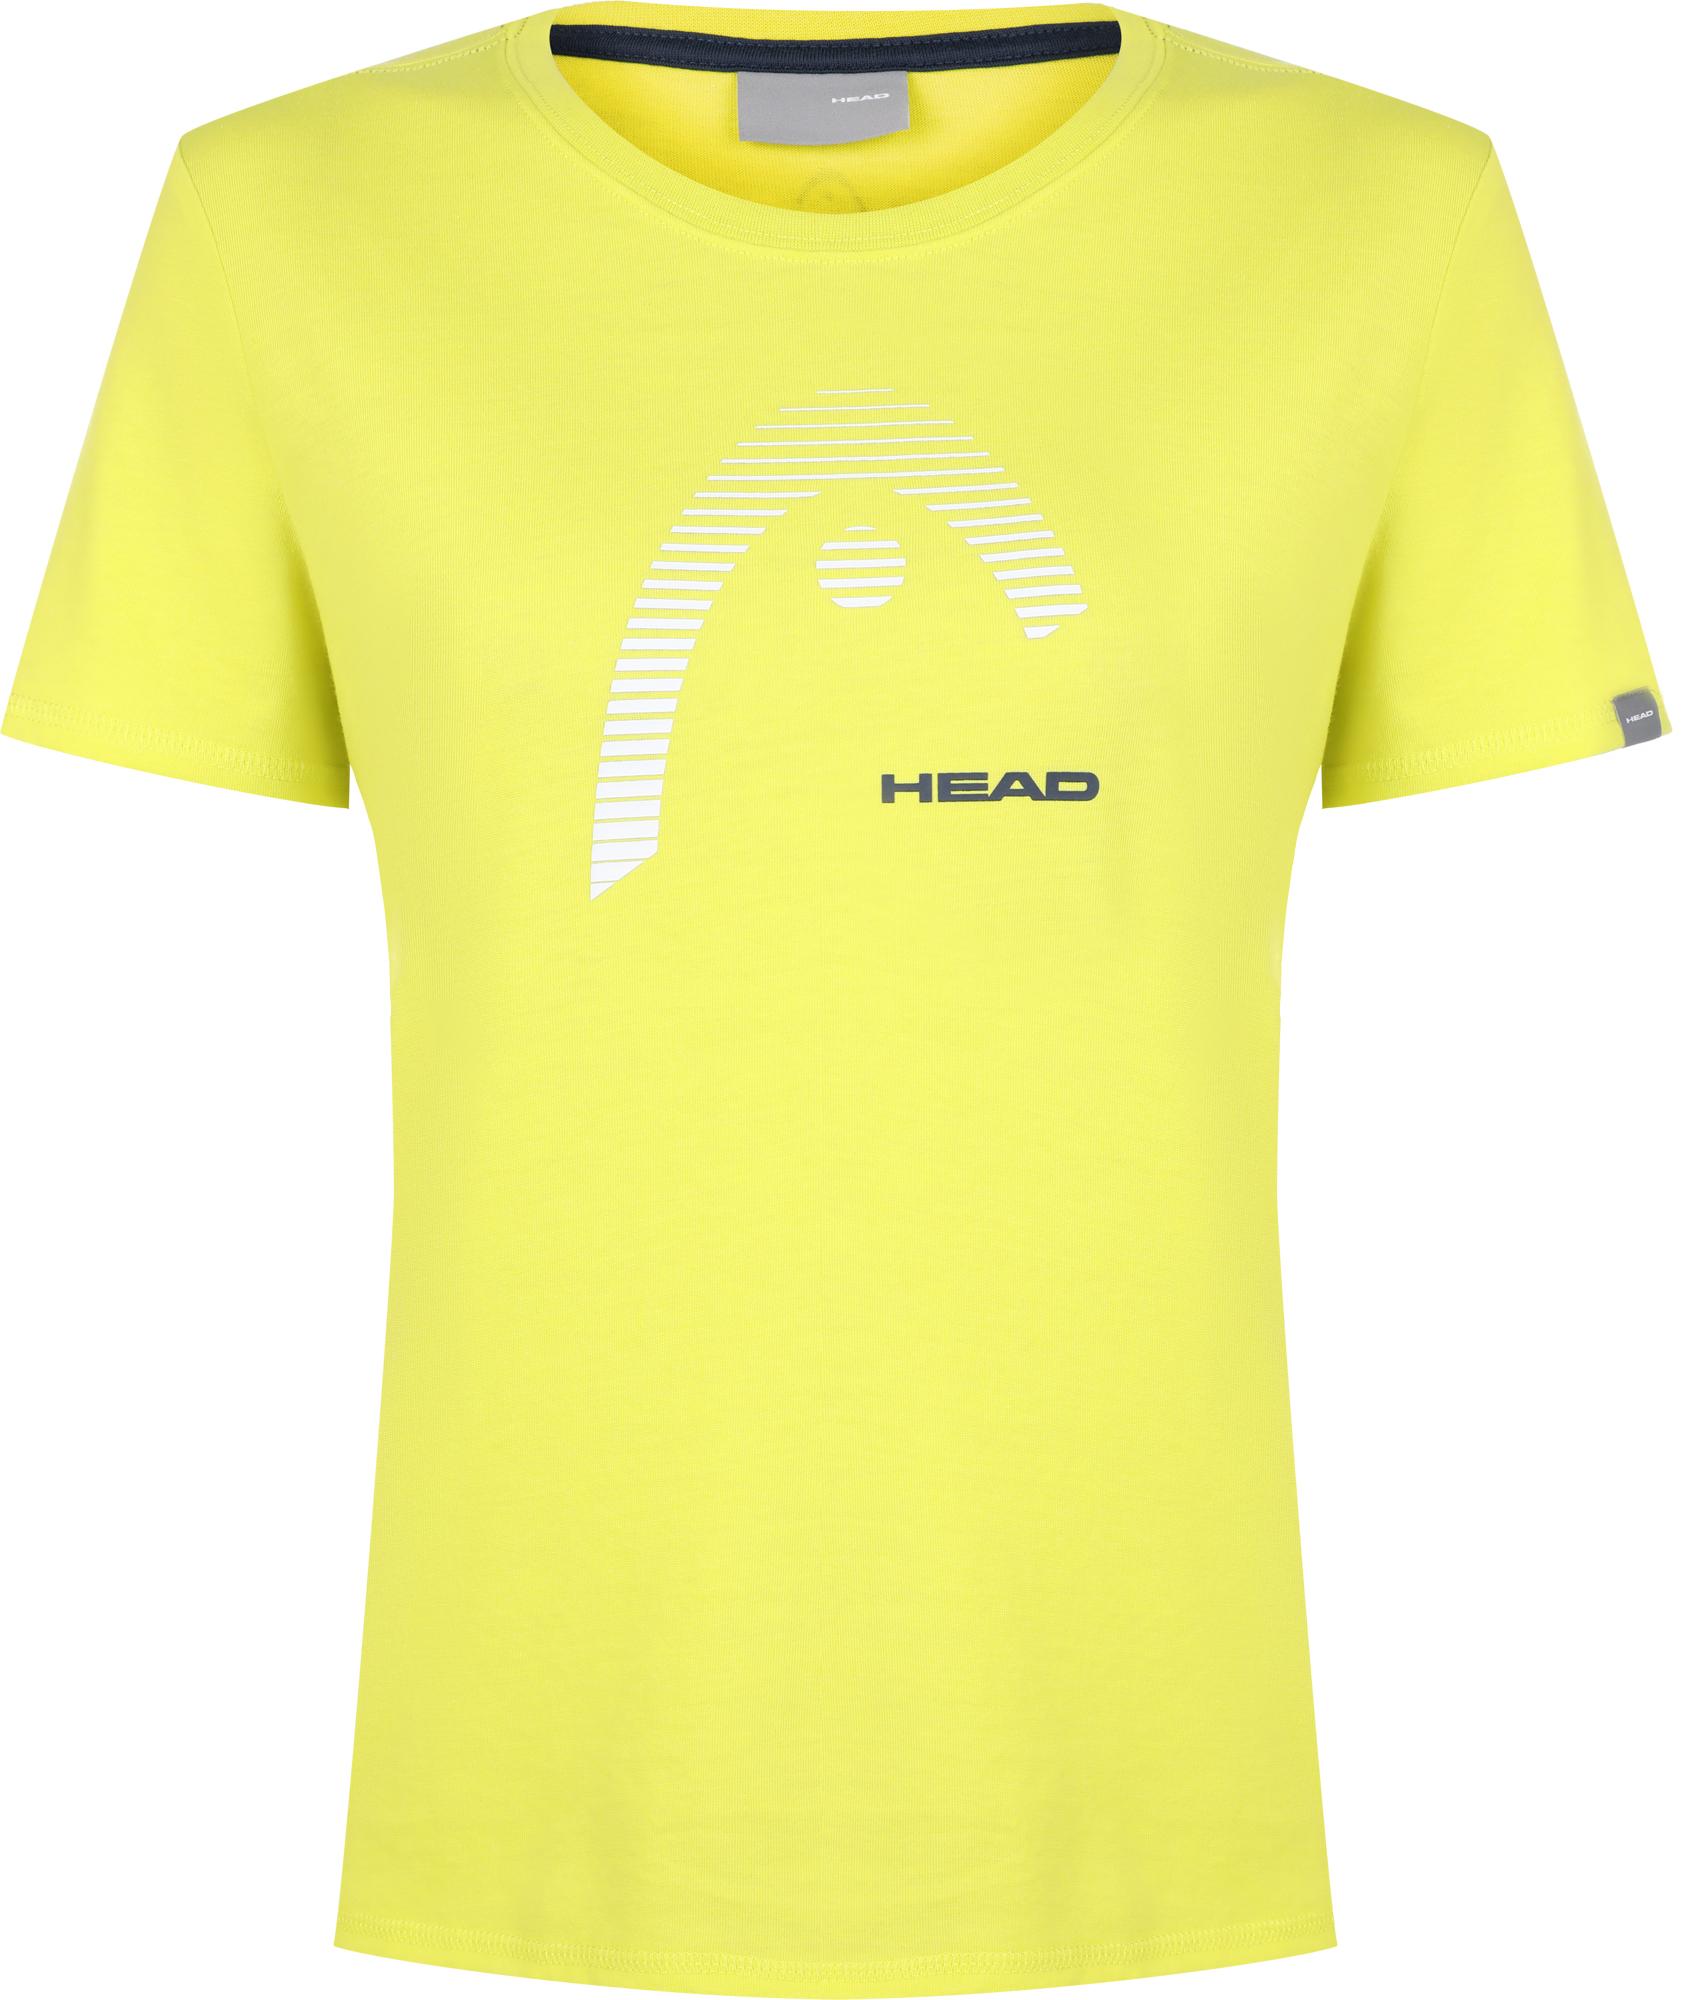 цена на Head Футболка женская Head Club Lara, размер 46-48